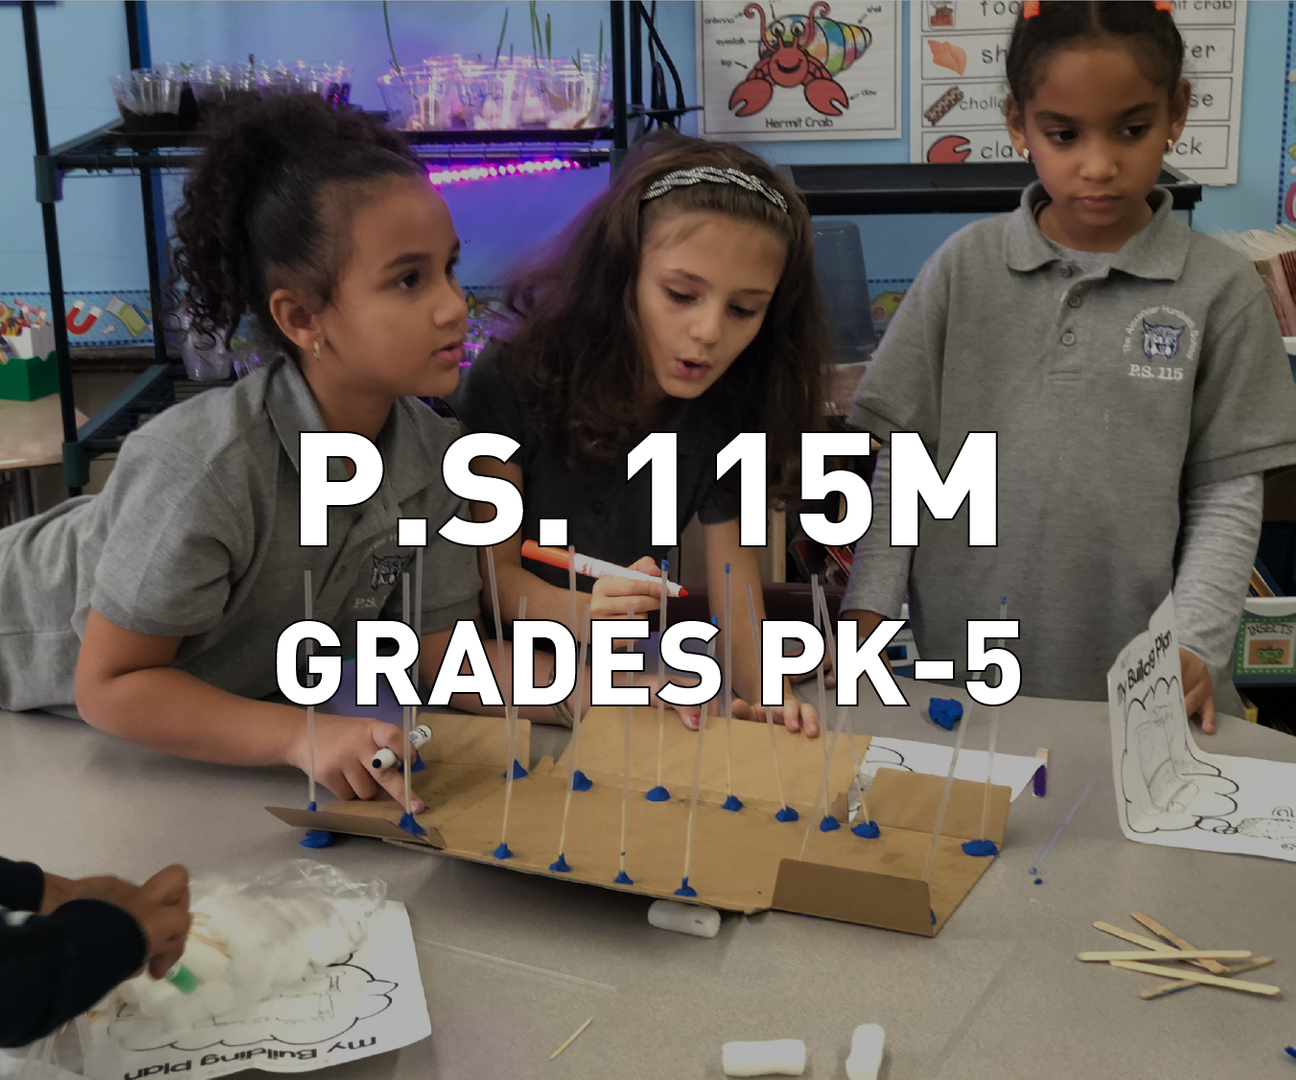 P.S. 115M Grades PK-5